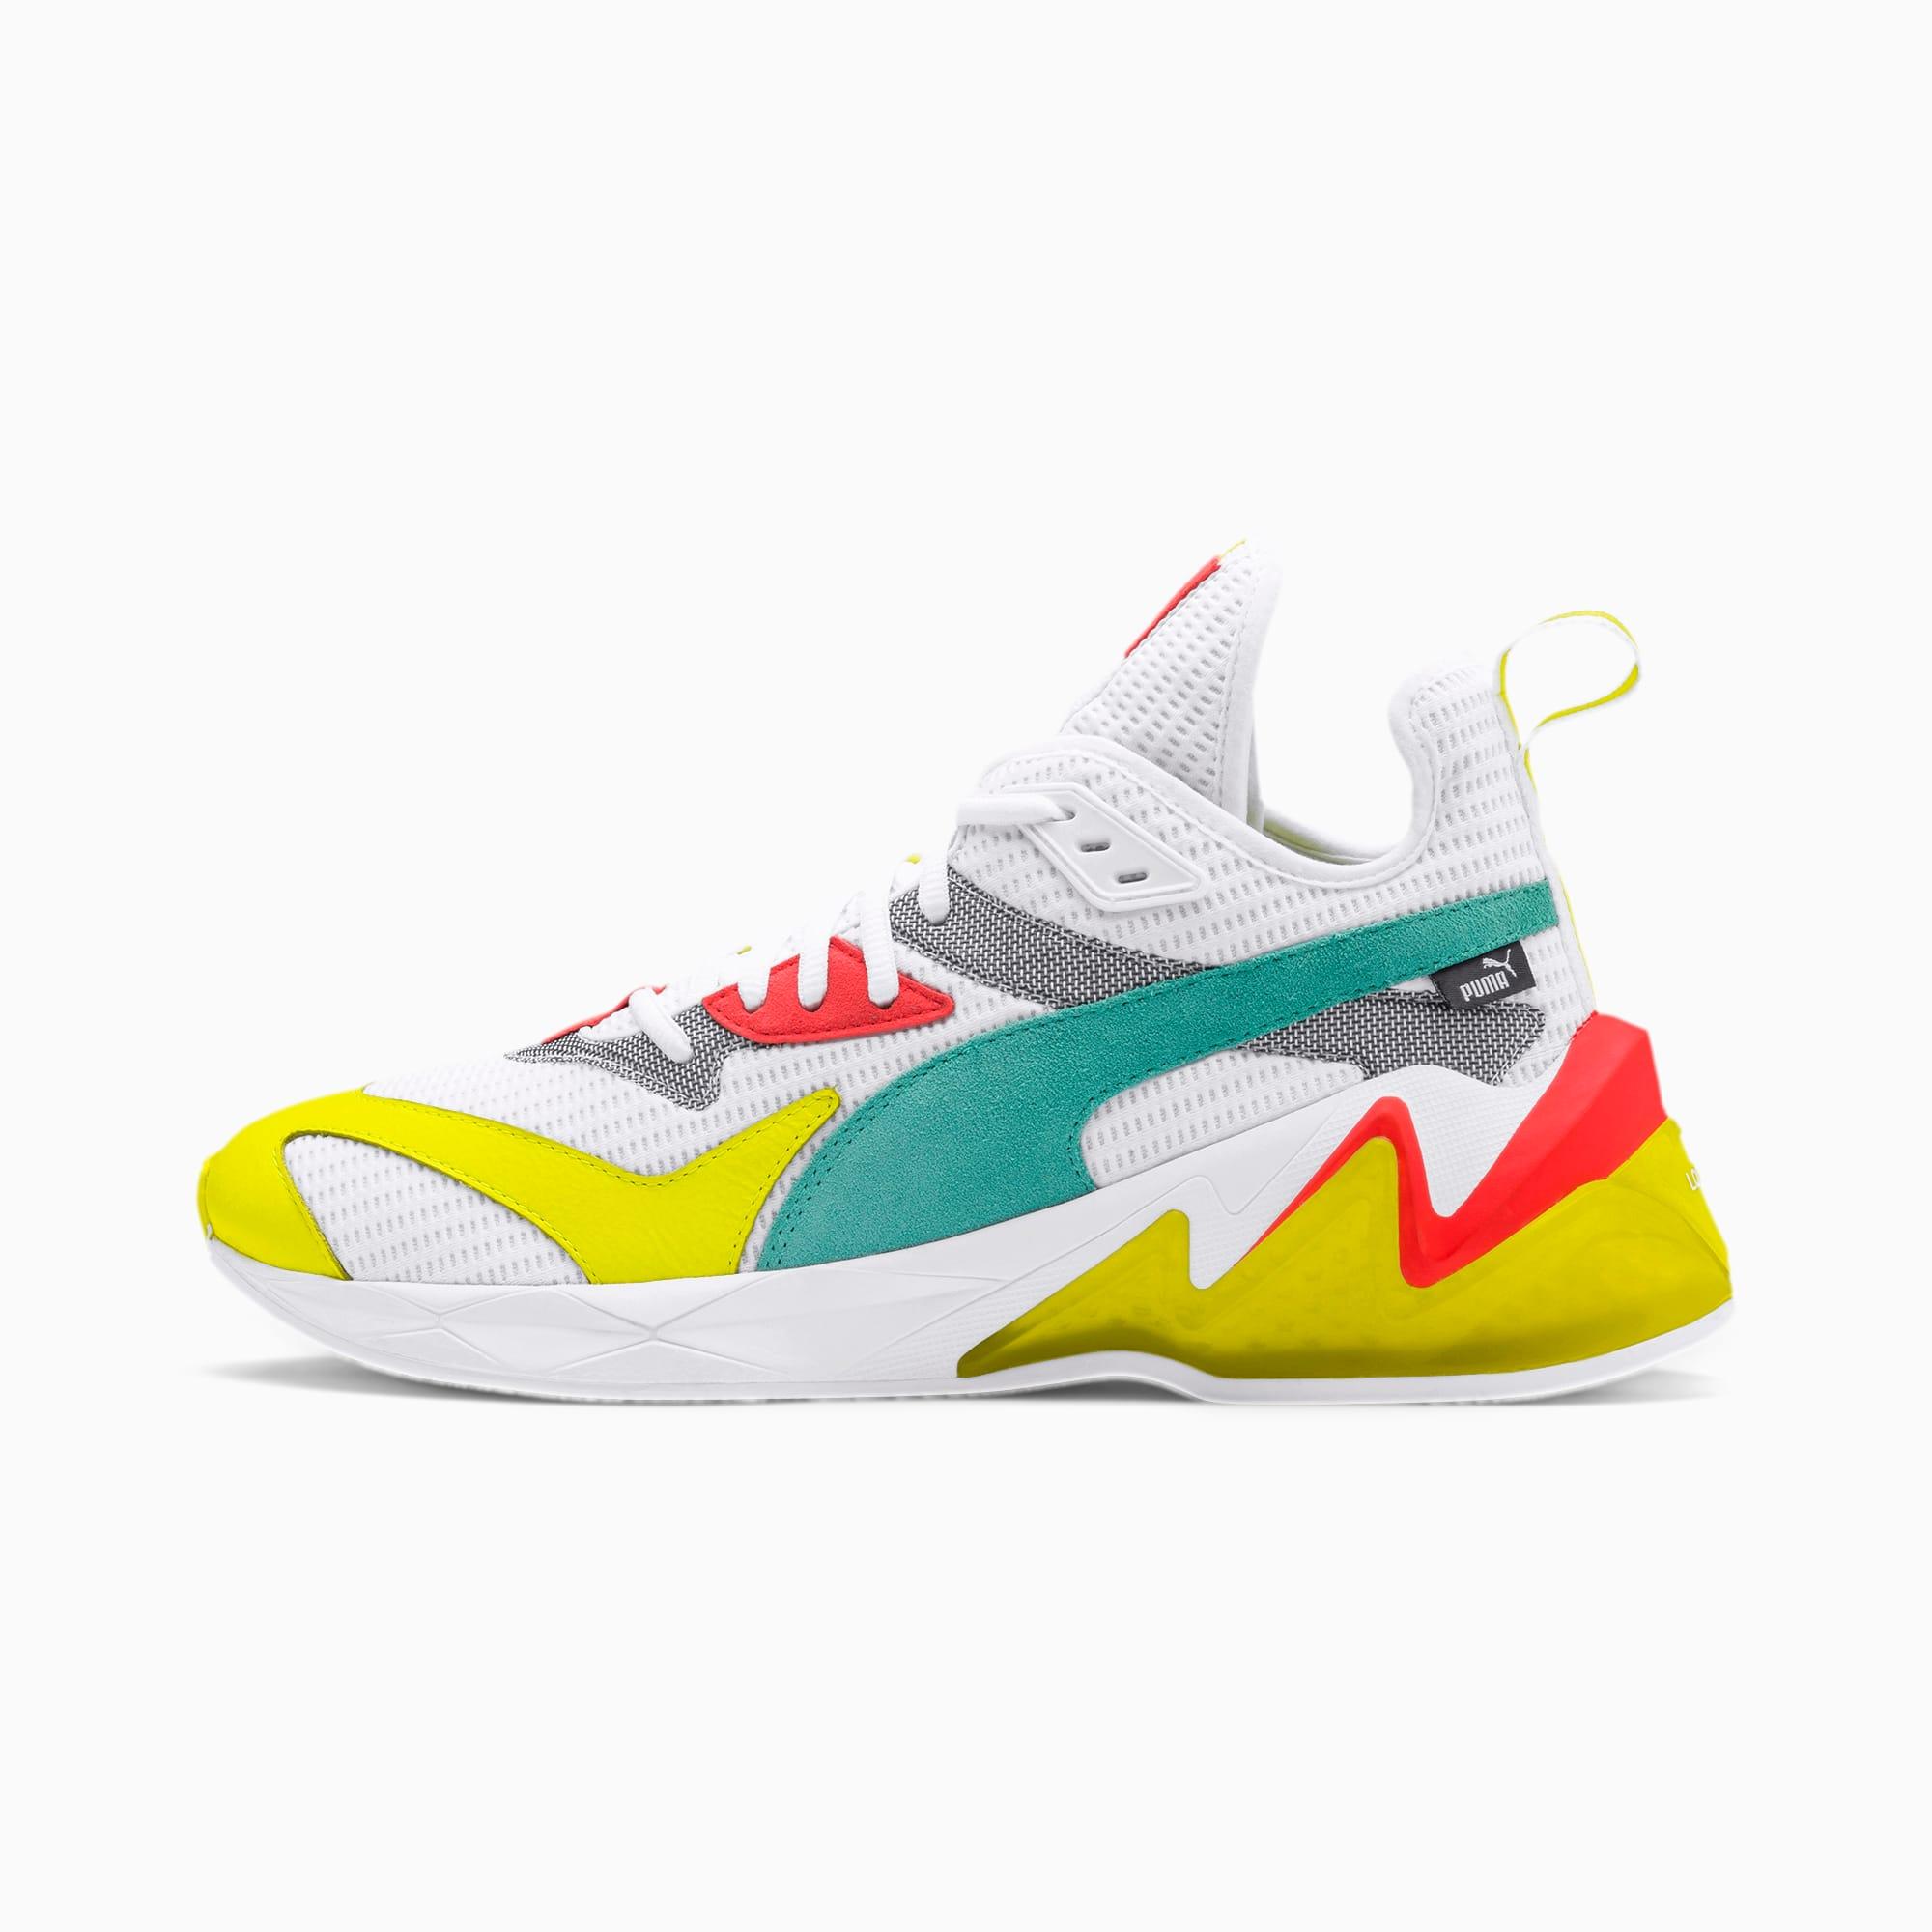 Puma basketball shoes – Shoes online